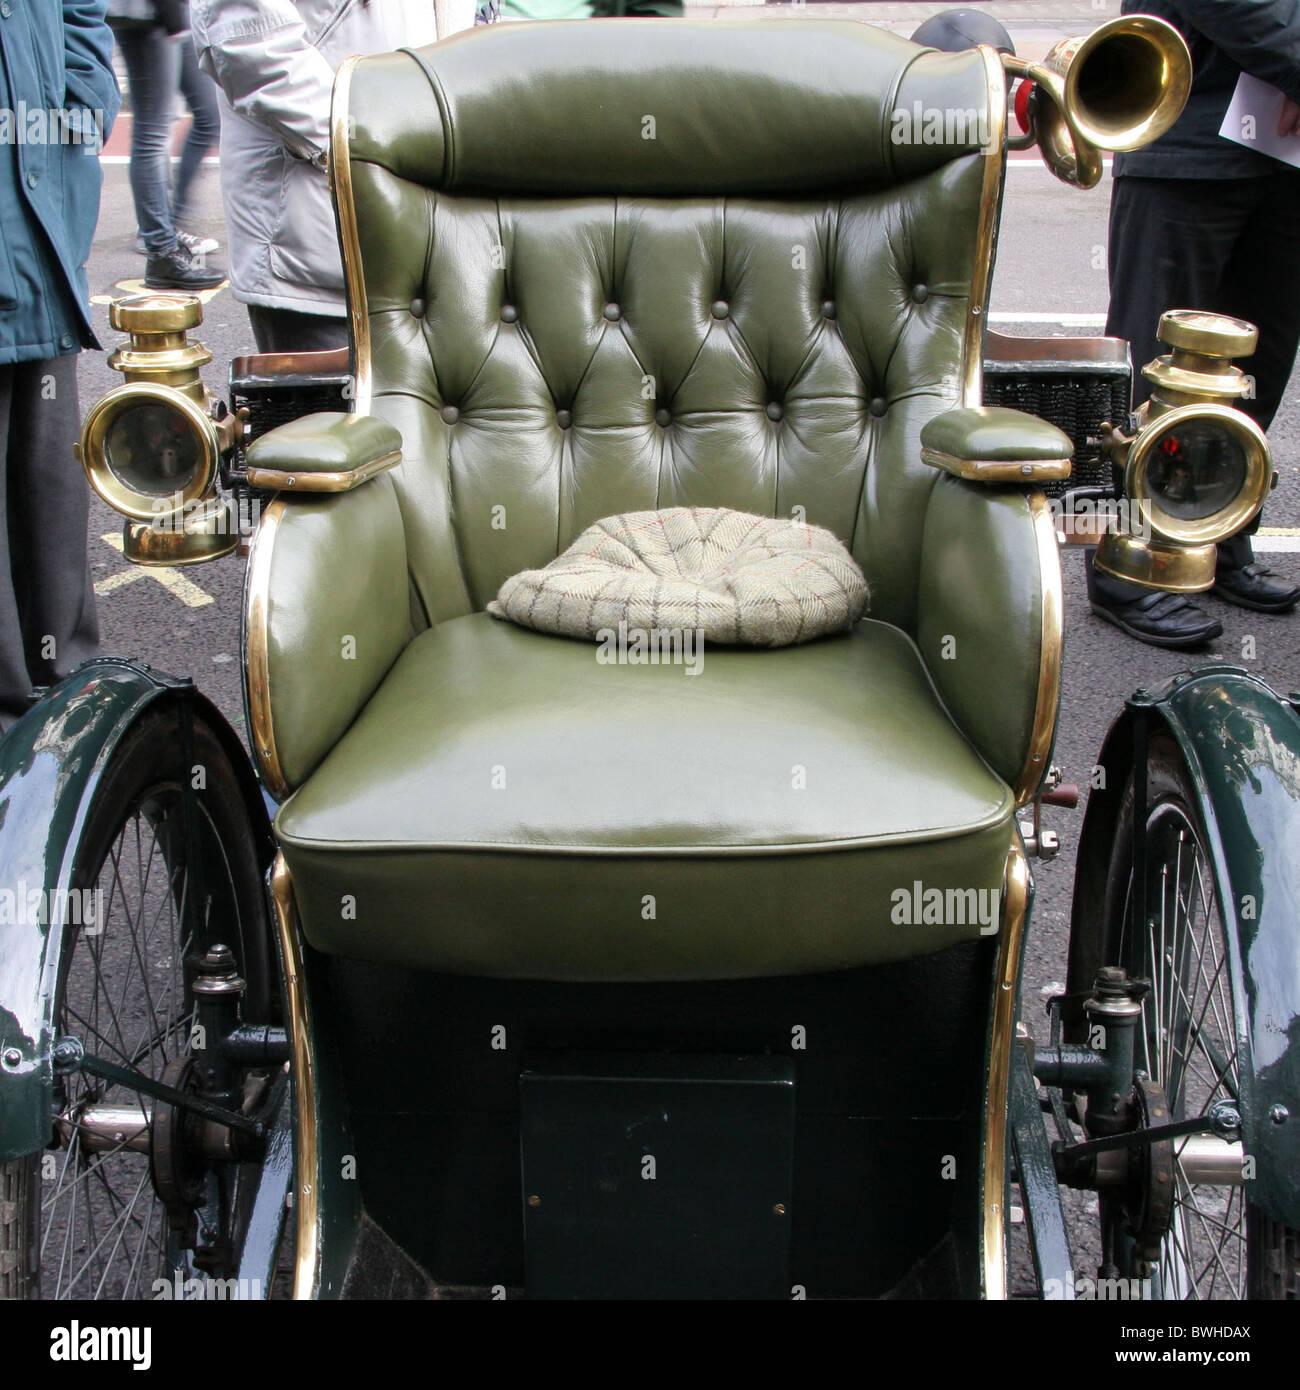 London to Brighton veteran cars on display in regent street. - Stock Image